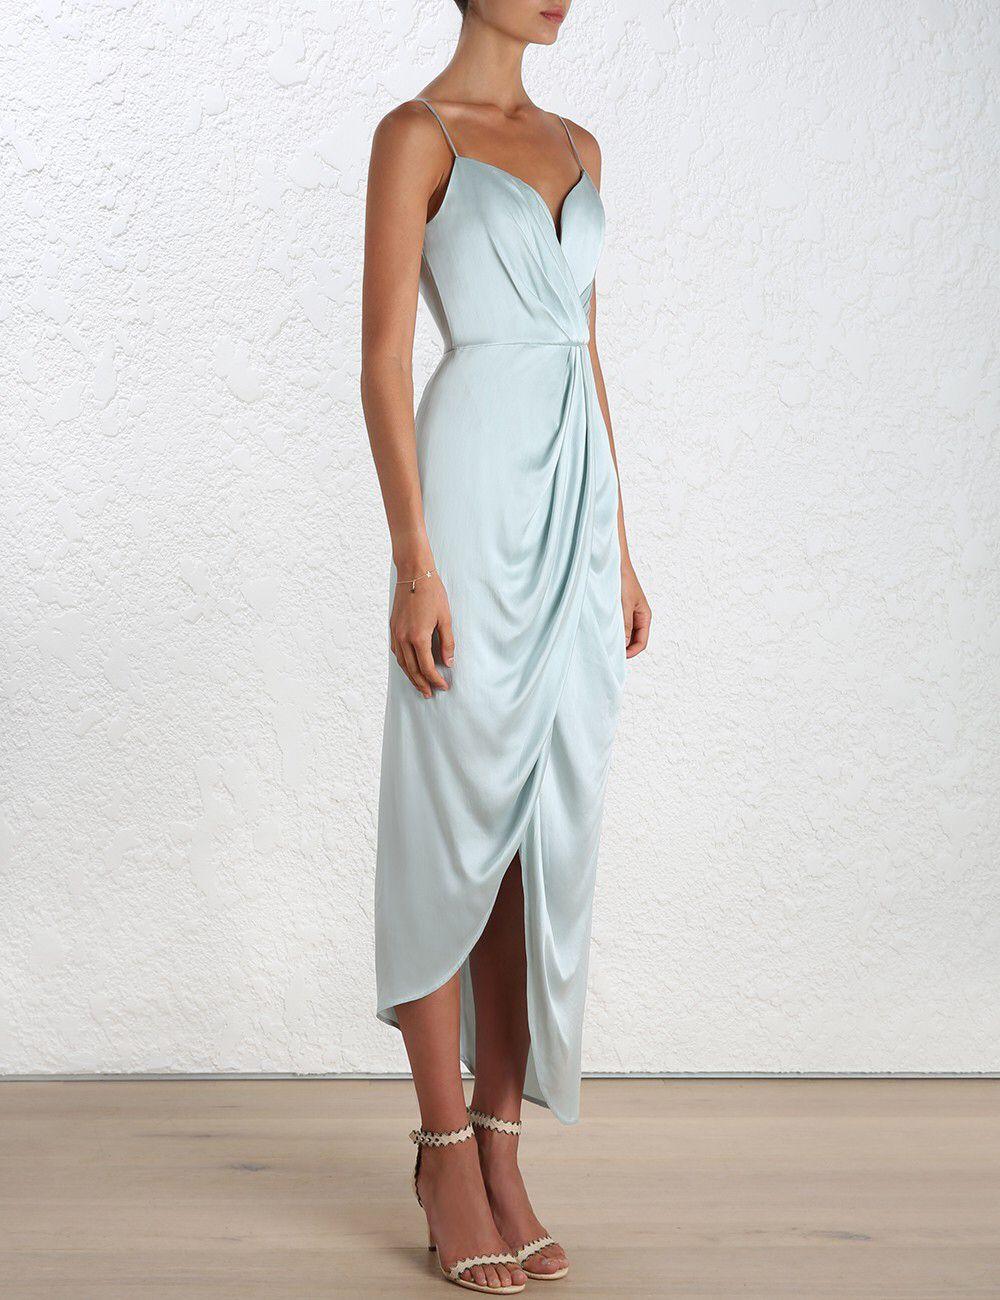 Zimmerman suede silk drape dress in Sage AW16  4e63a881d